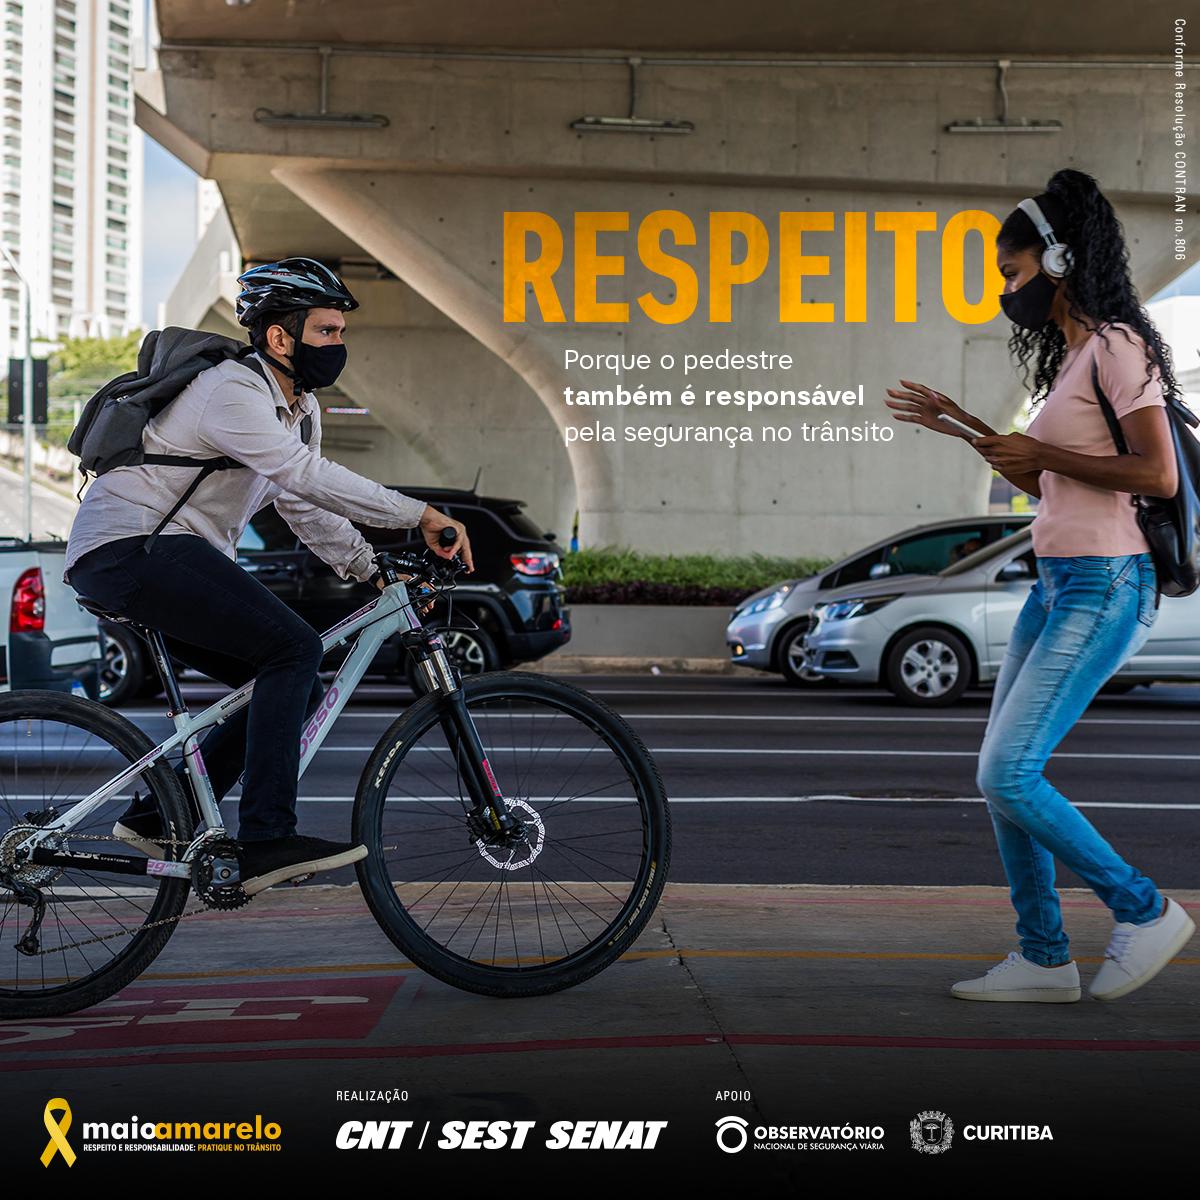 Respeito - Pedestre e Ciclista